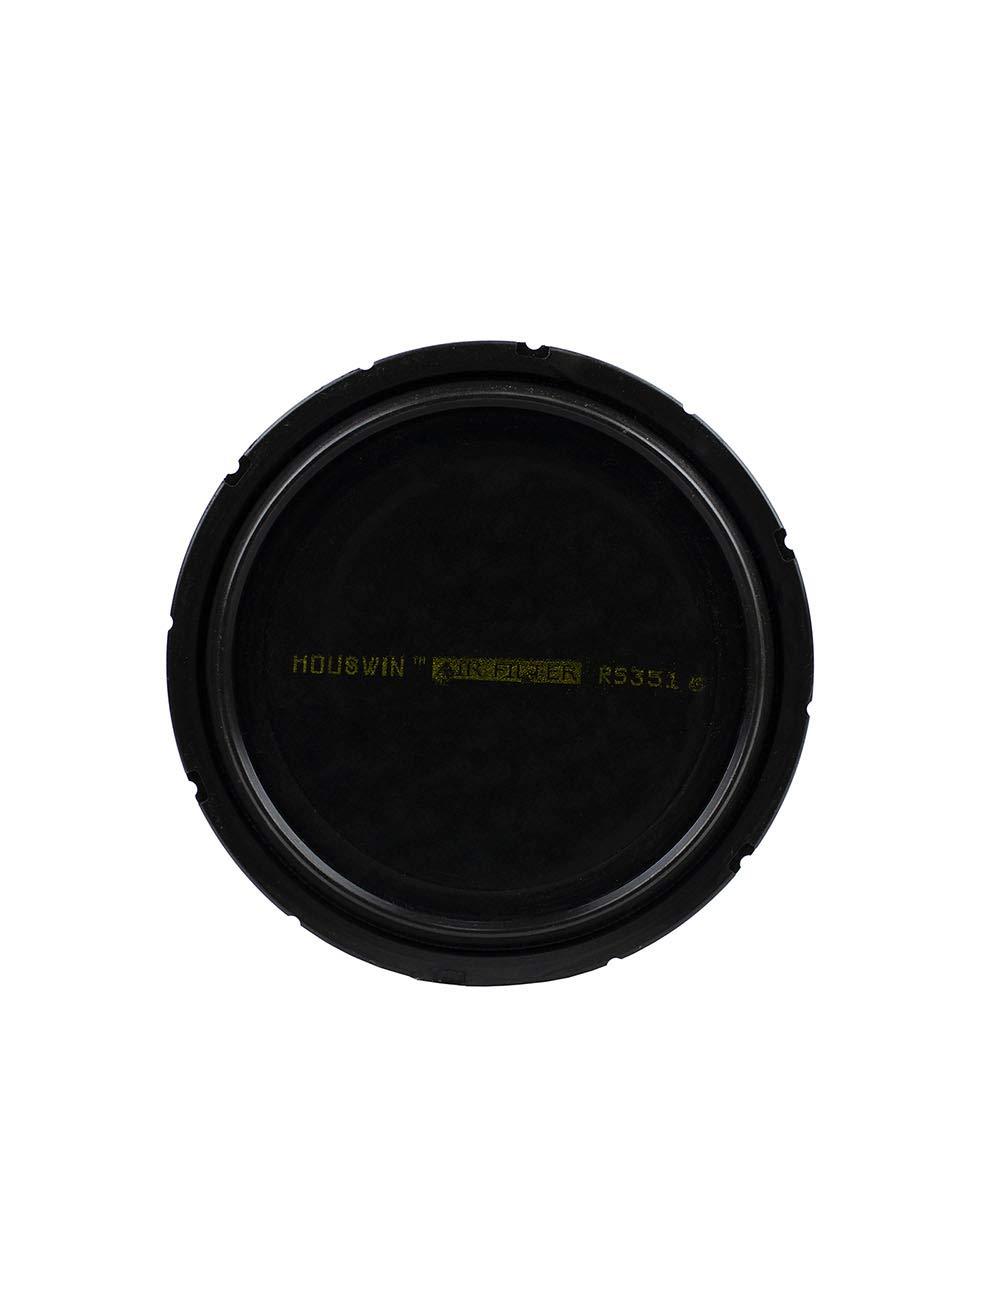 Houswin Semi Truck RS3516 Heavy Duty Air Filter by TRUCK FAIRINGS COM (Image #4)